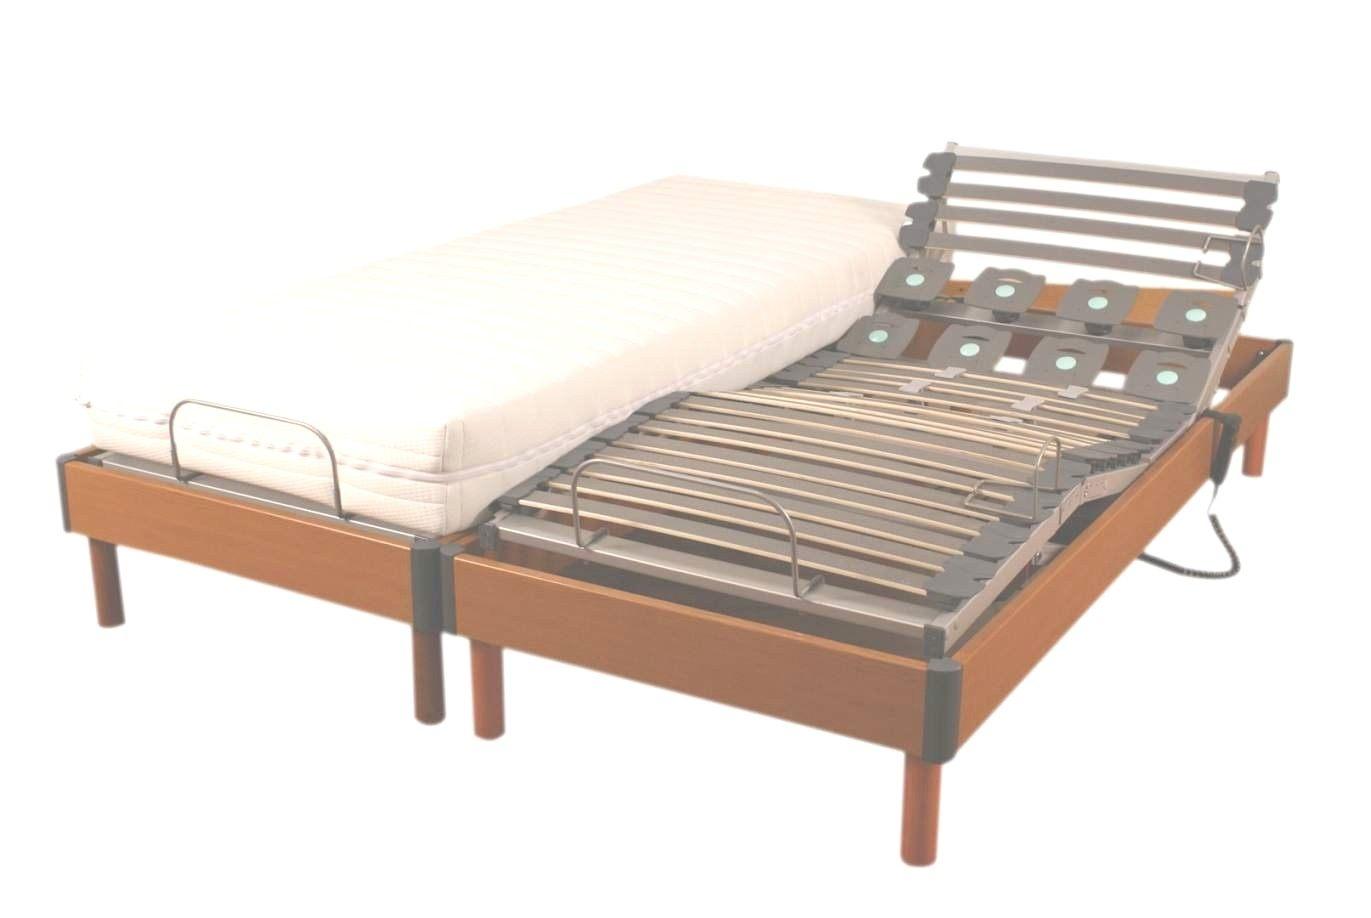 Ikealit Fabulous Ikea Matras Hovag Better Ikea Lit Ikea Bed Box